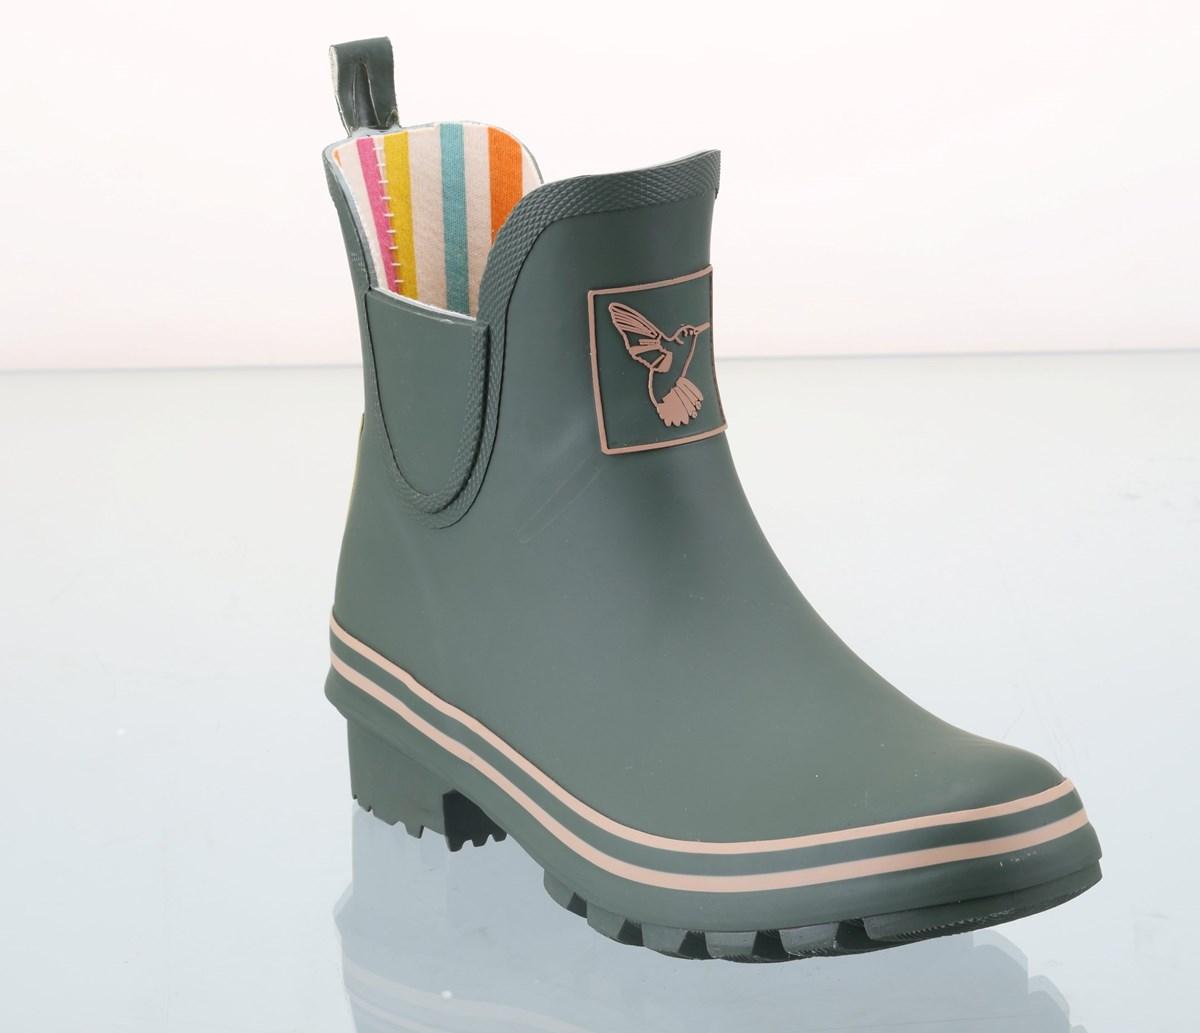 Fantastic Womens Girls Farm Garden Fashion Rain Outdoor Wellies Shoes Boots UK 3 4 5 6 7 8 | EBay